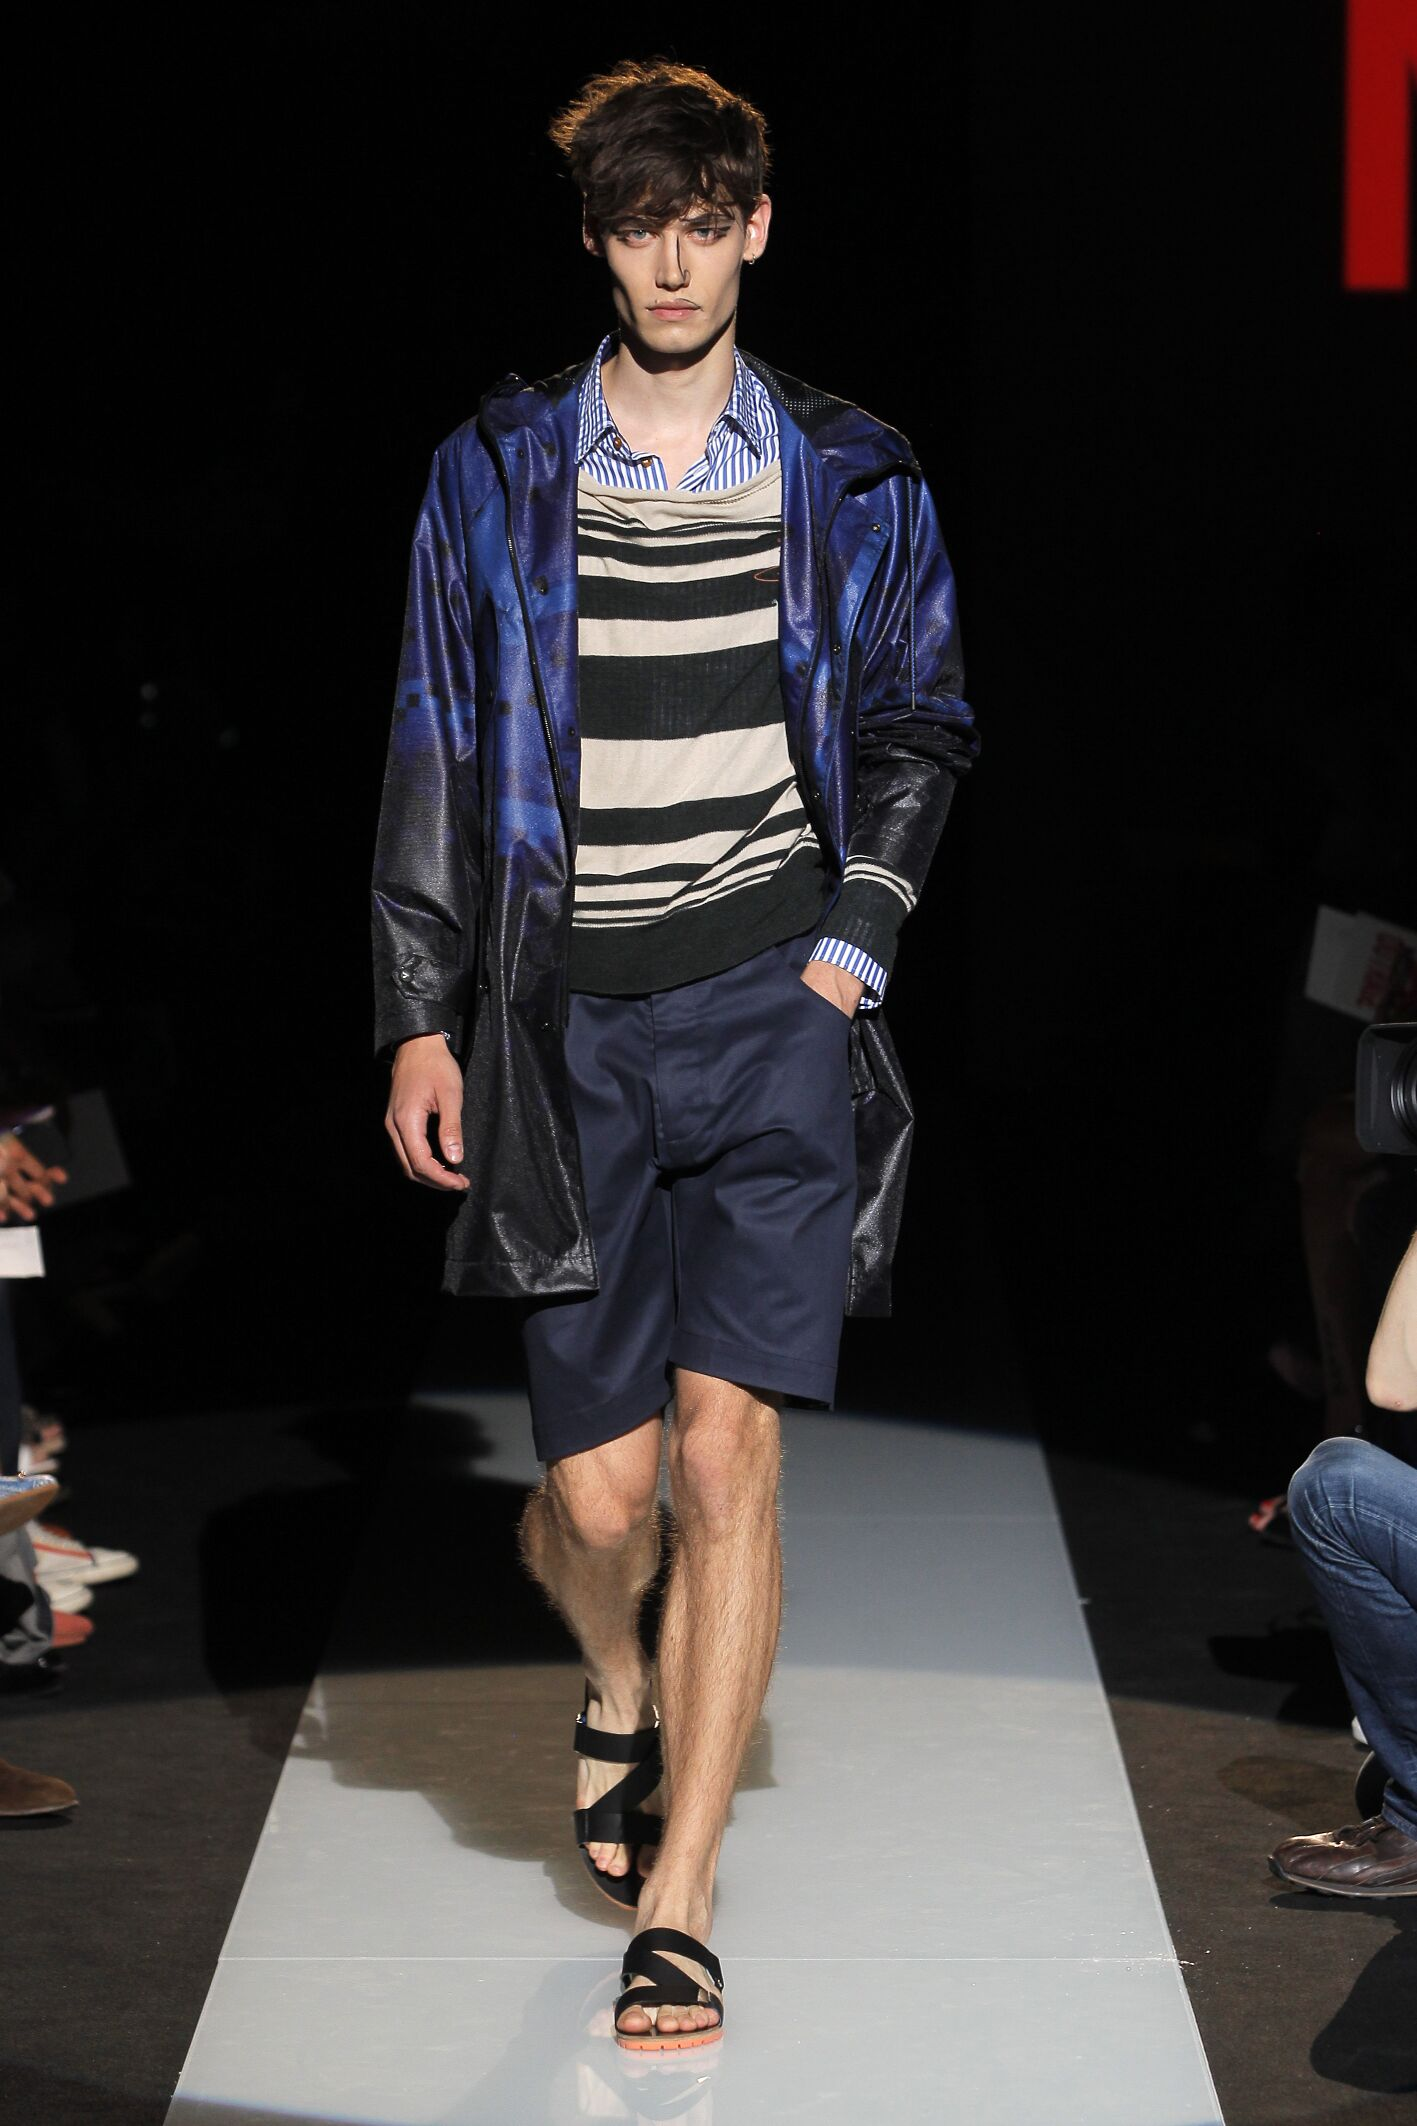 Fashion Man Model Vivienne Westwood Catwalk